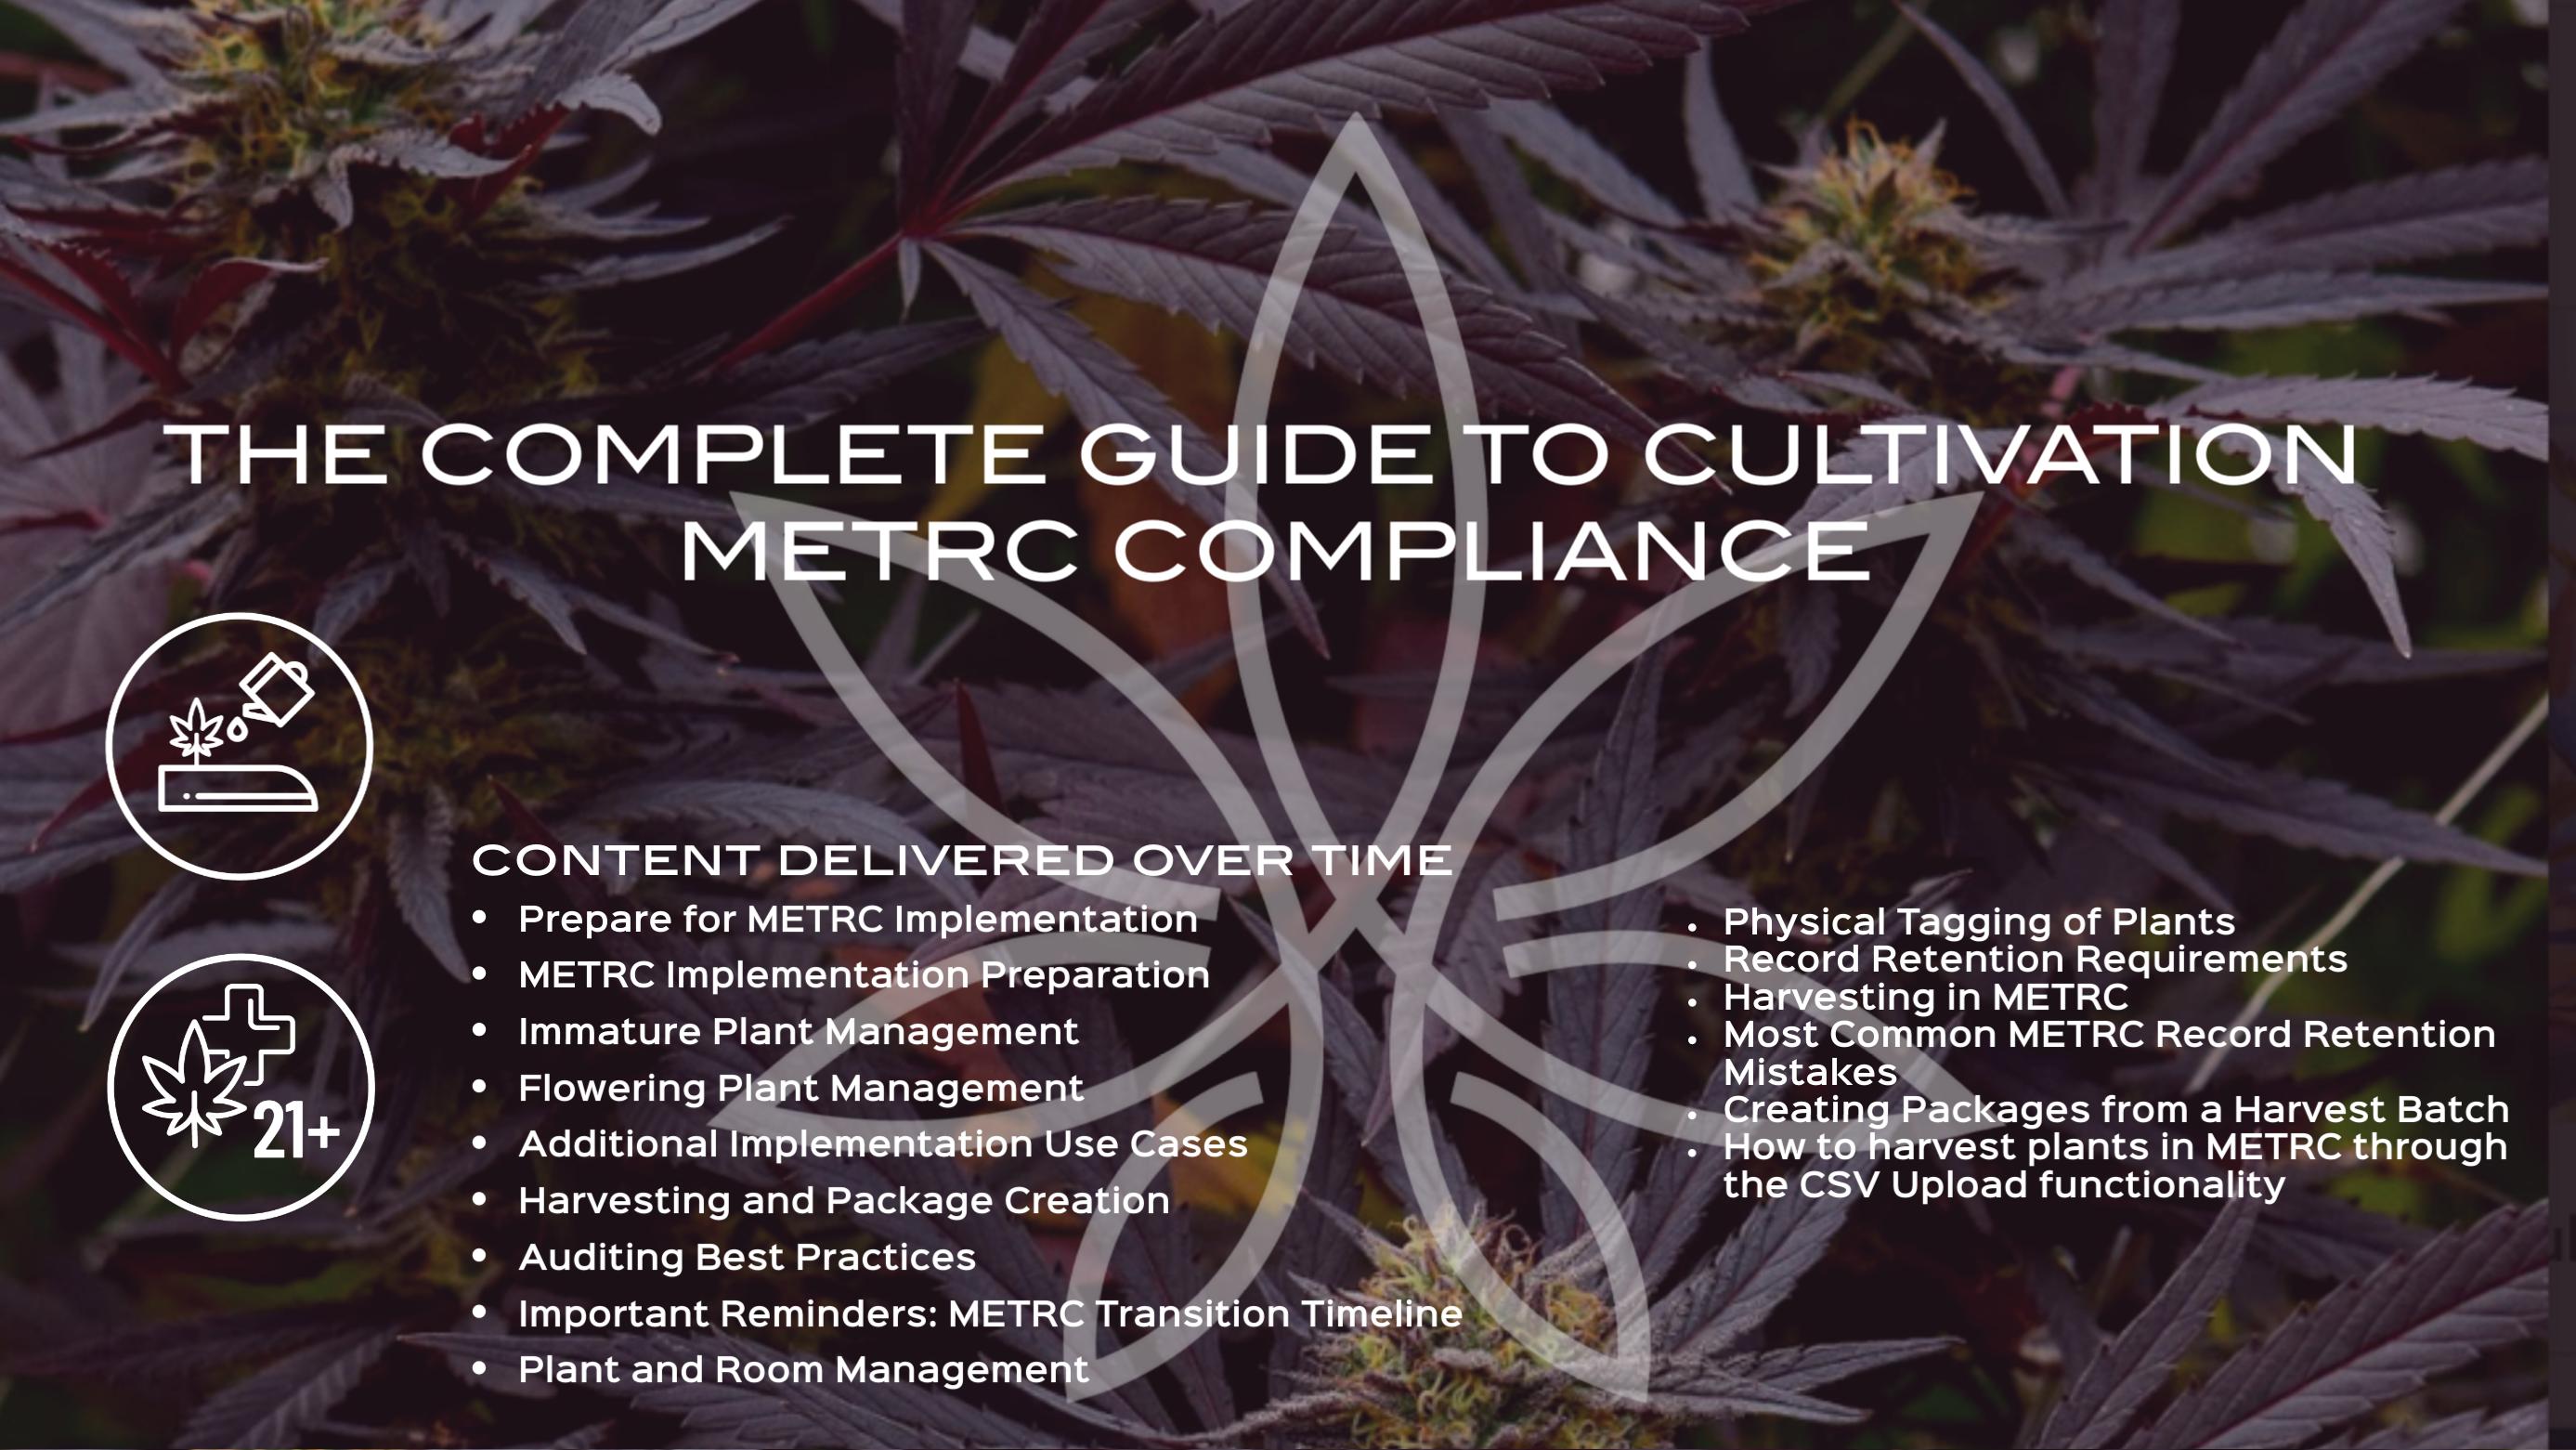 THE COMPLETE GUIDE TO CULTIVATION METRC COMPLIANCE RMCC METRC tickets, METRC training, Oklahoma cannabis, Maine Cannabis, Oregon Cannabis, coronavirus, cannabis certification